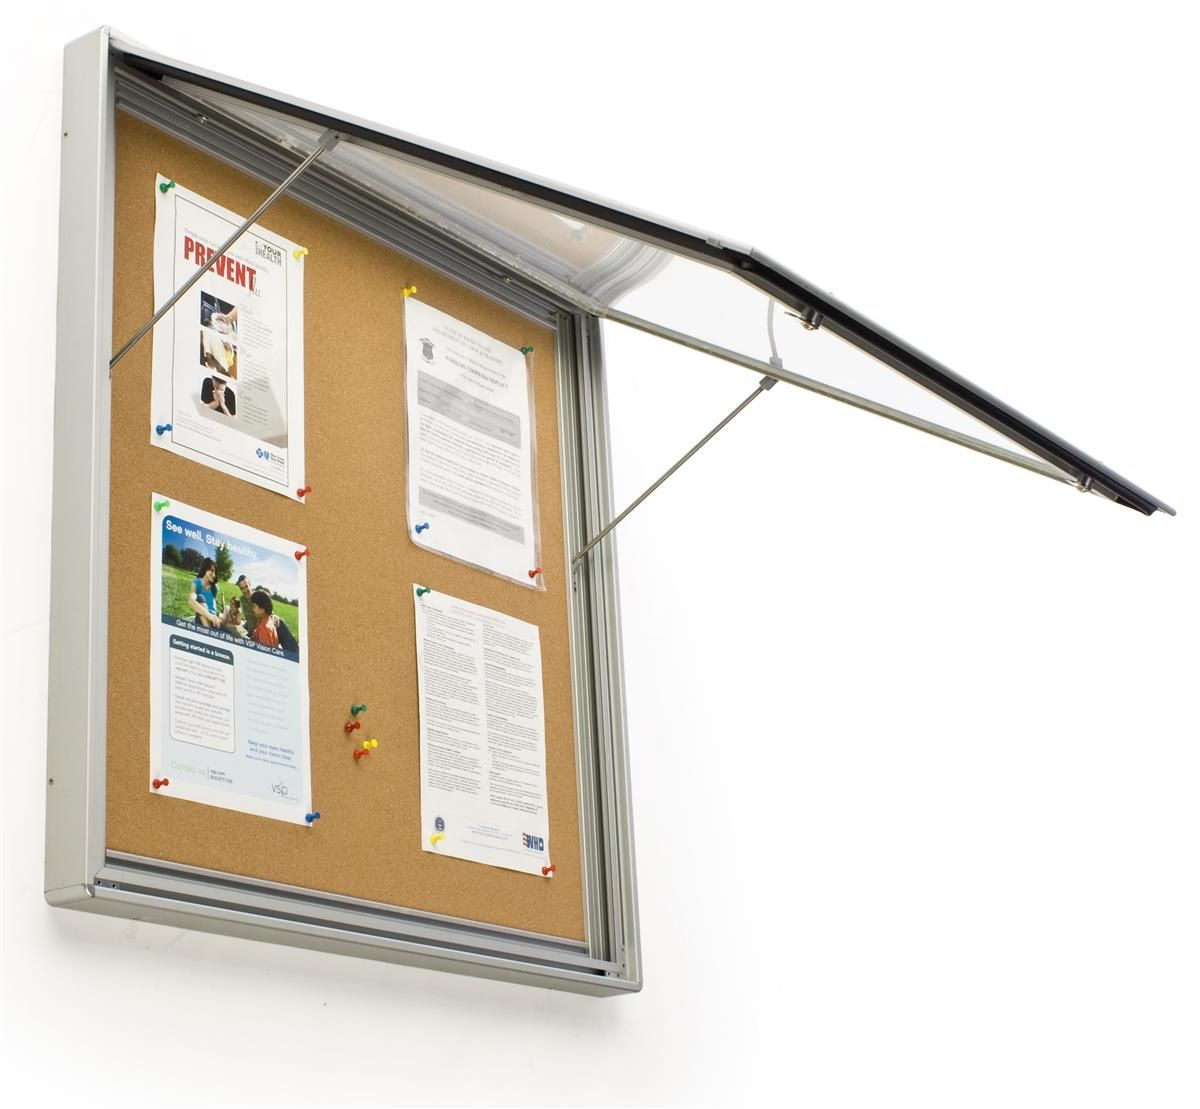 32 X 32 Enclosed Bulletin Board For Outdoor Use With Locking Door Silver In 2020 Bulletin Boards Door Prop Wall Board